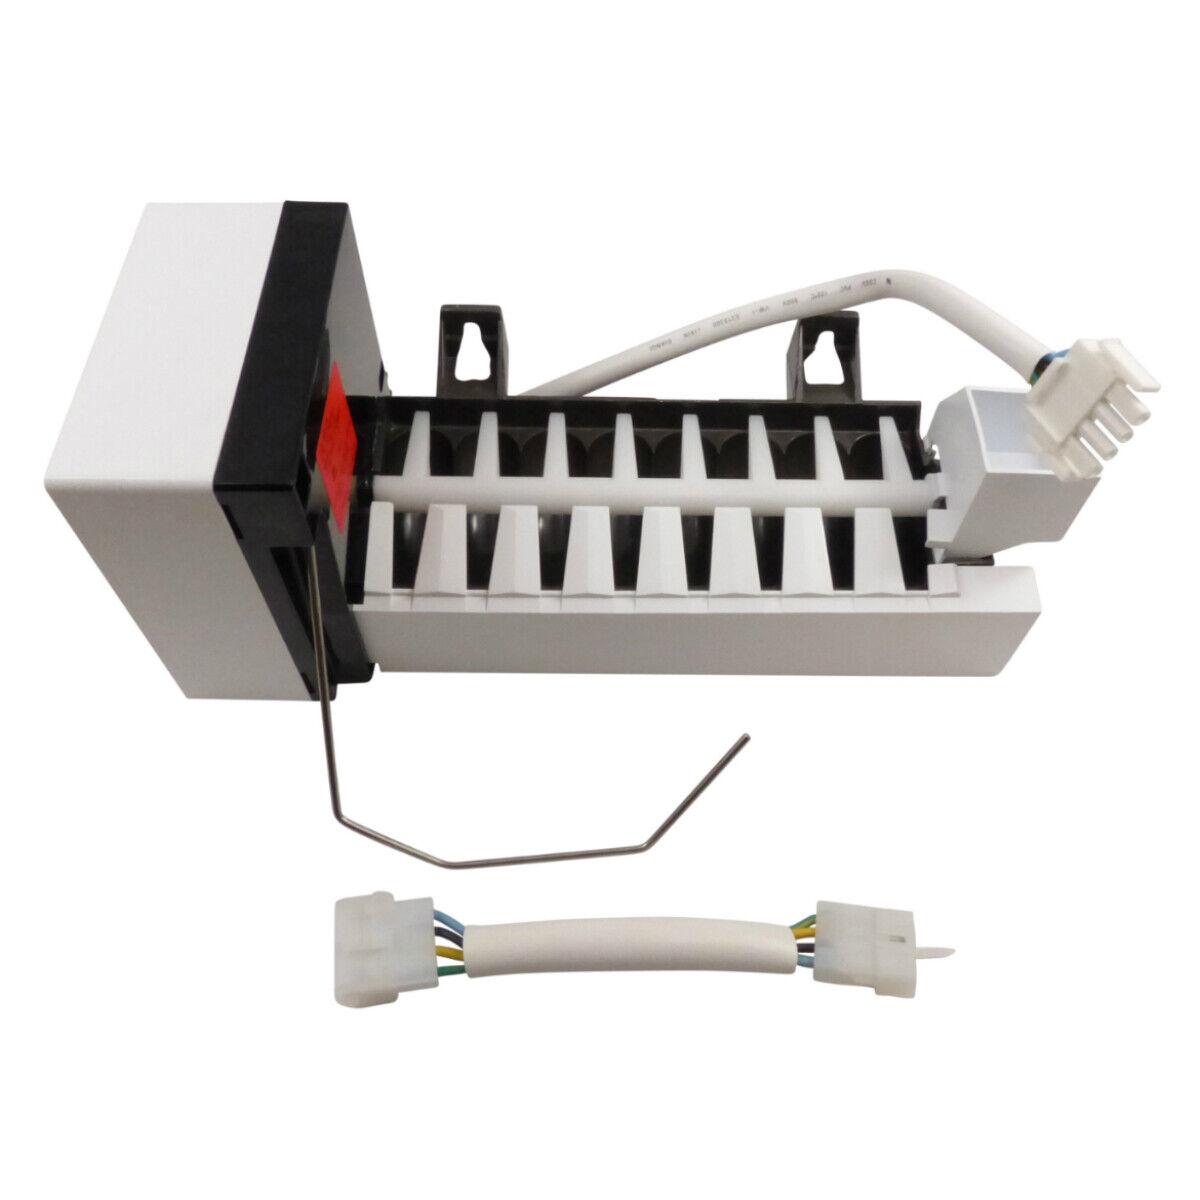 Kitchen Basics 101: 5304445222/241642501 Refrigerator Ice Maker Kit Replacement